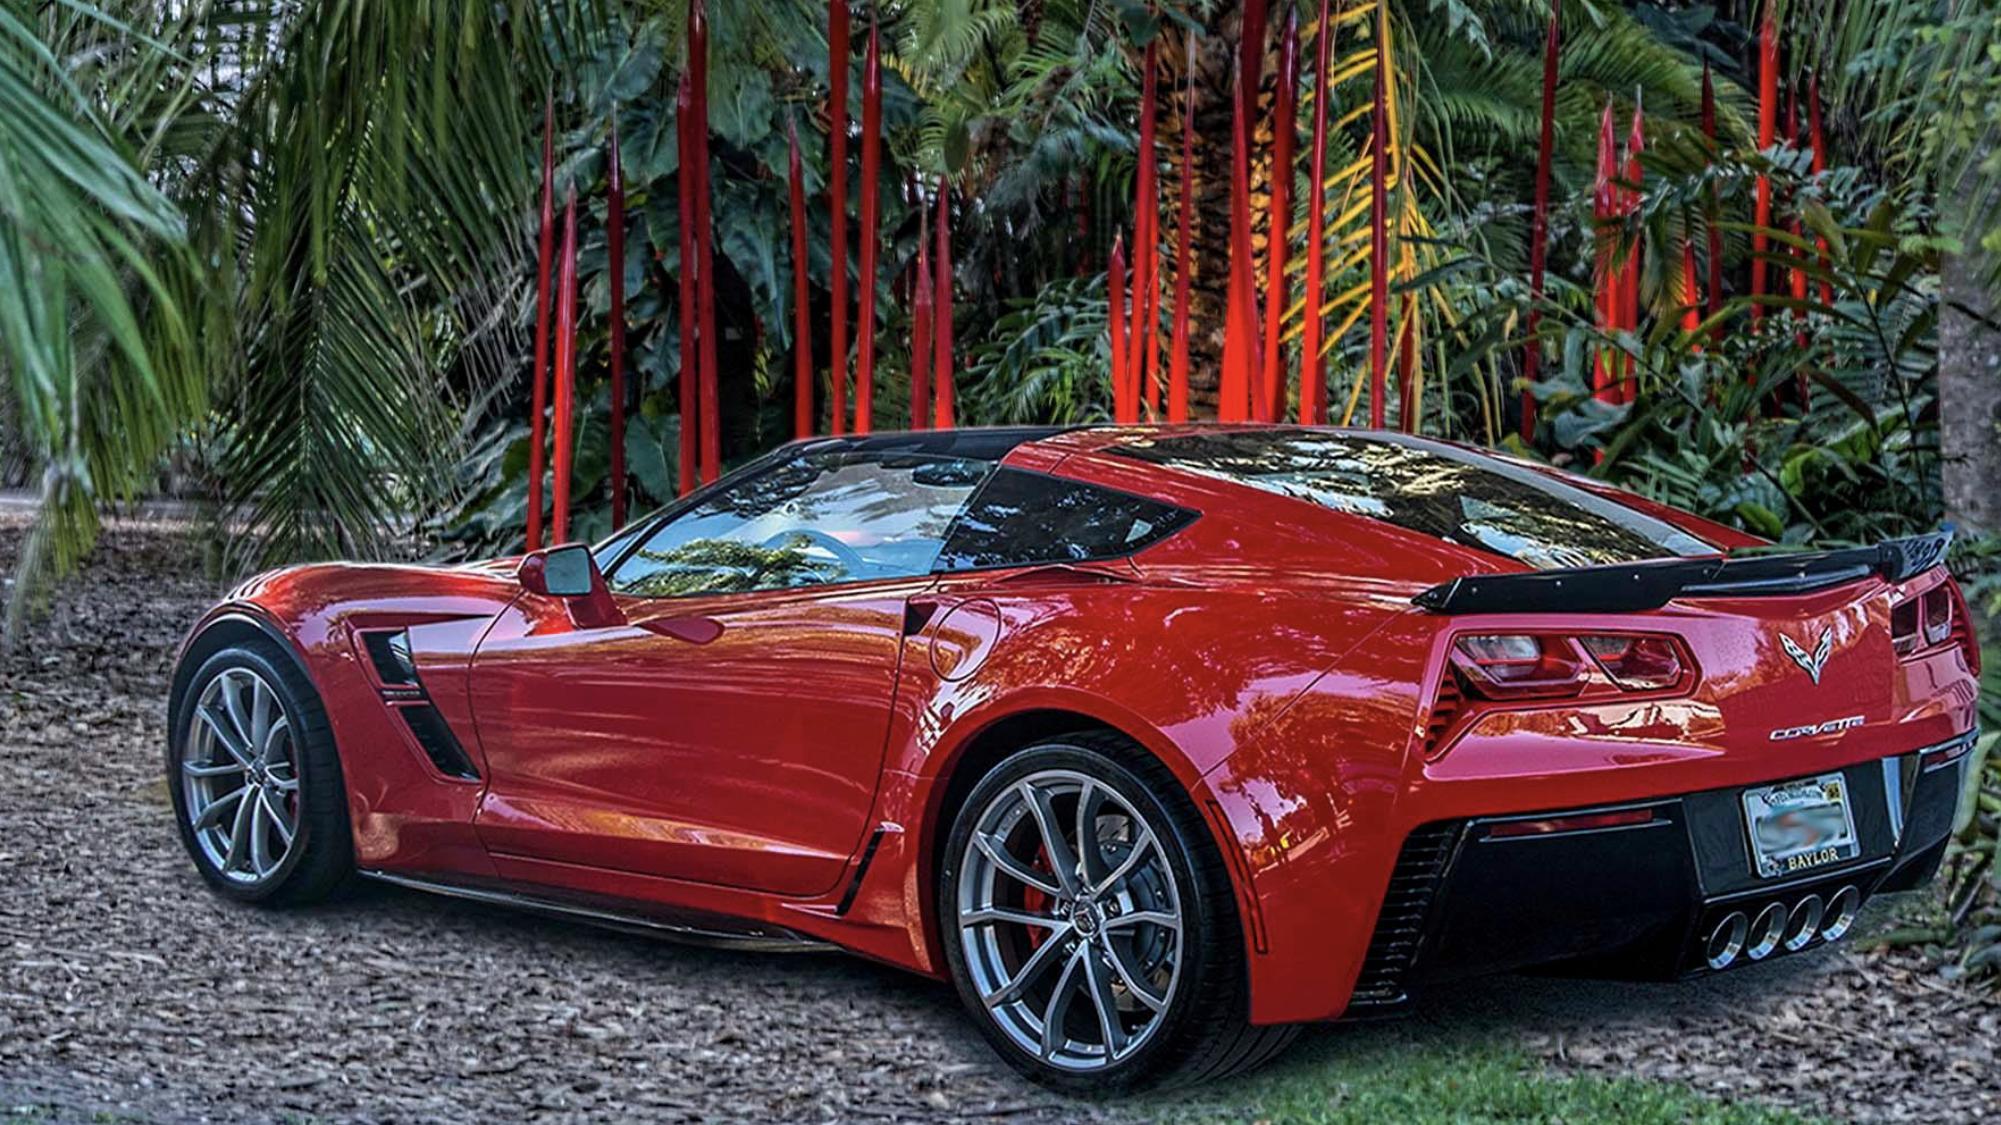 Pin By Mike Oaks On C7 Grand Sport Corvette In 2020 Corvette Summer Corvette Grand Sport Chevrolet Corvette